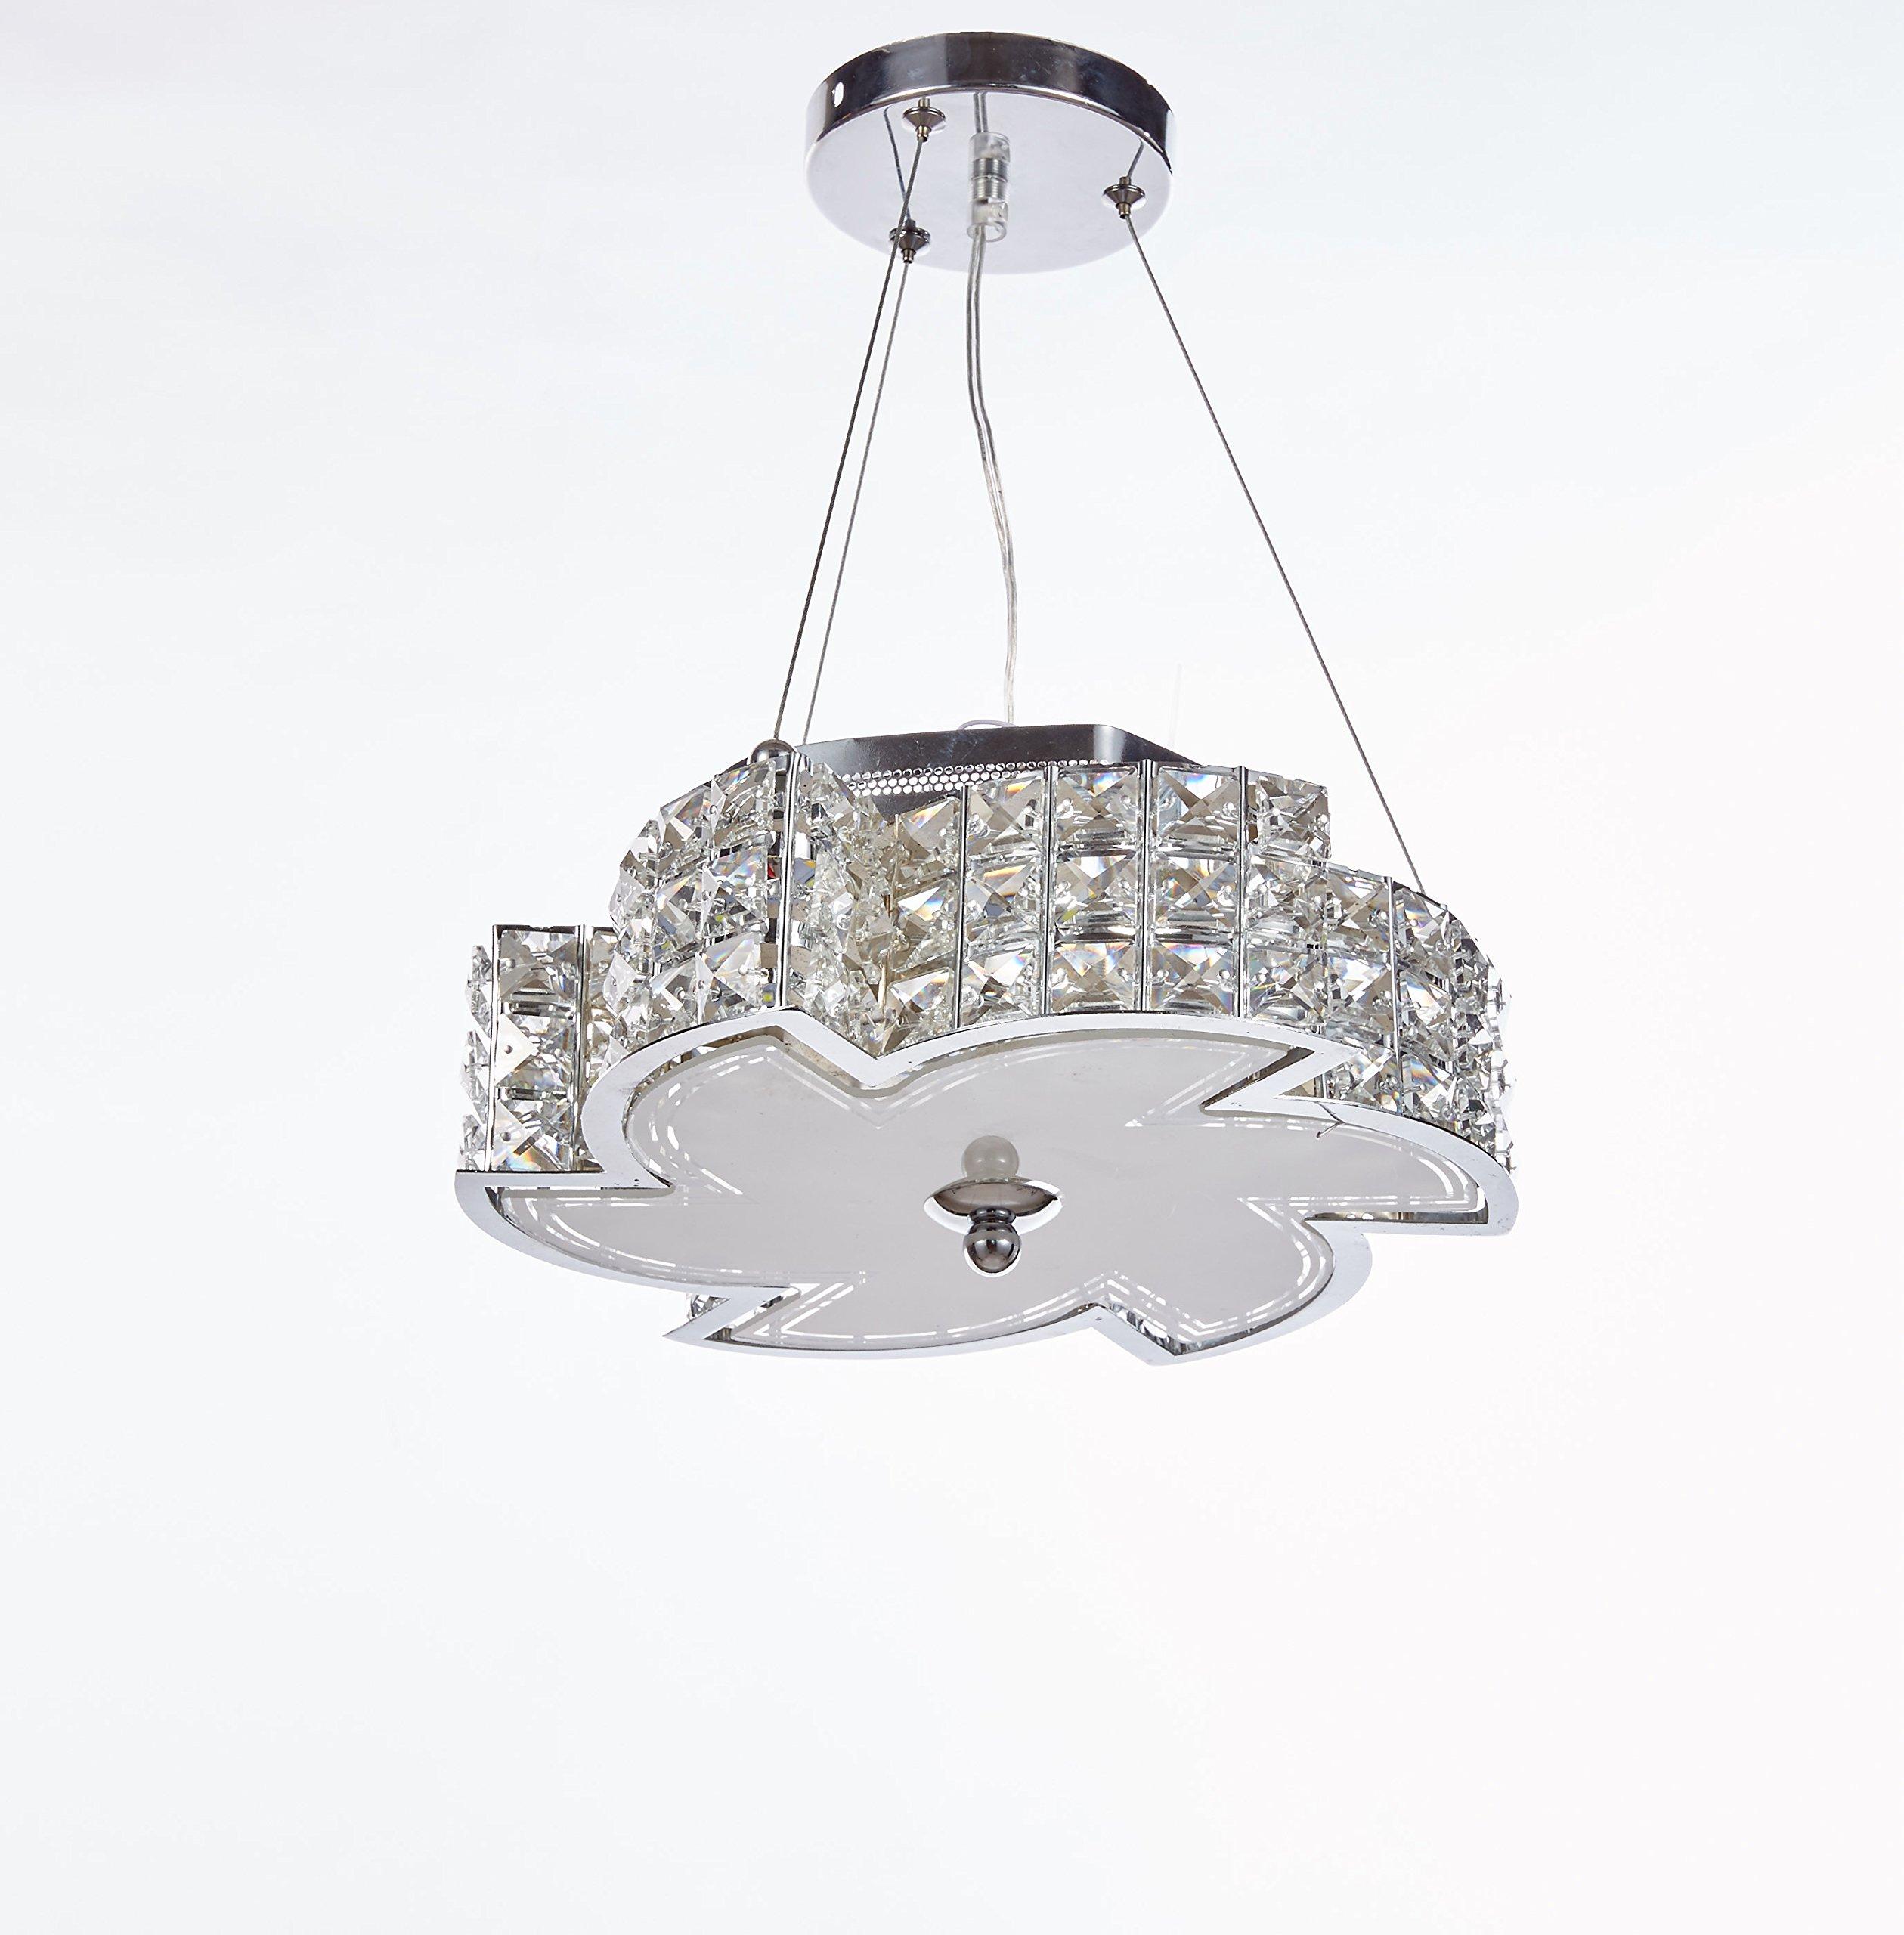 Diamond Life Modern LED Crystal Chandelier Pendant Hanging or Flush Mount Ceiling Lighting Fixture, 3 light colors in one Smart Lamp, #506